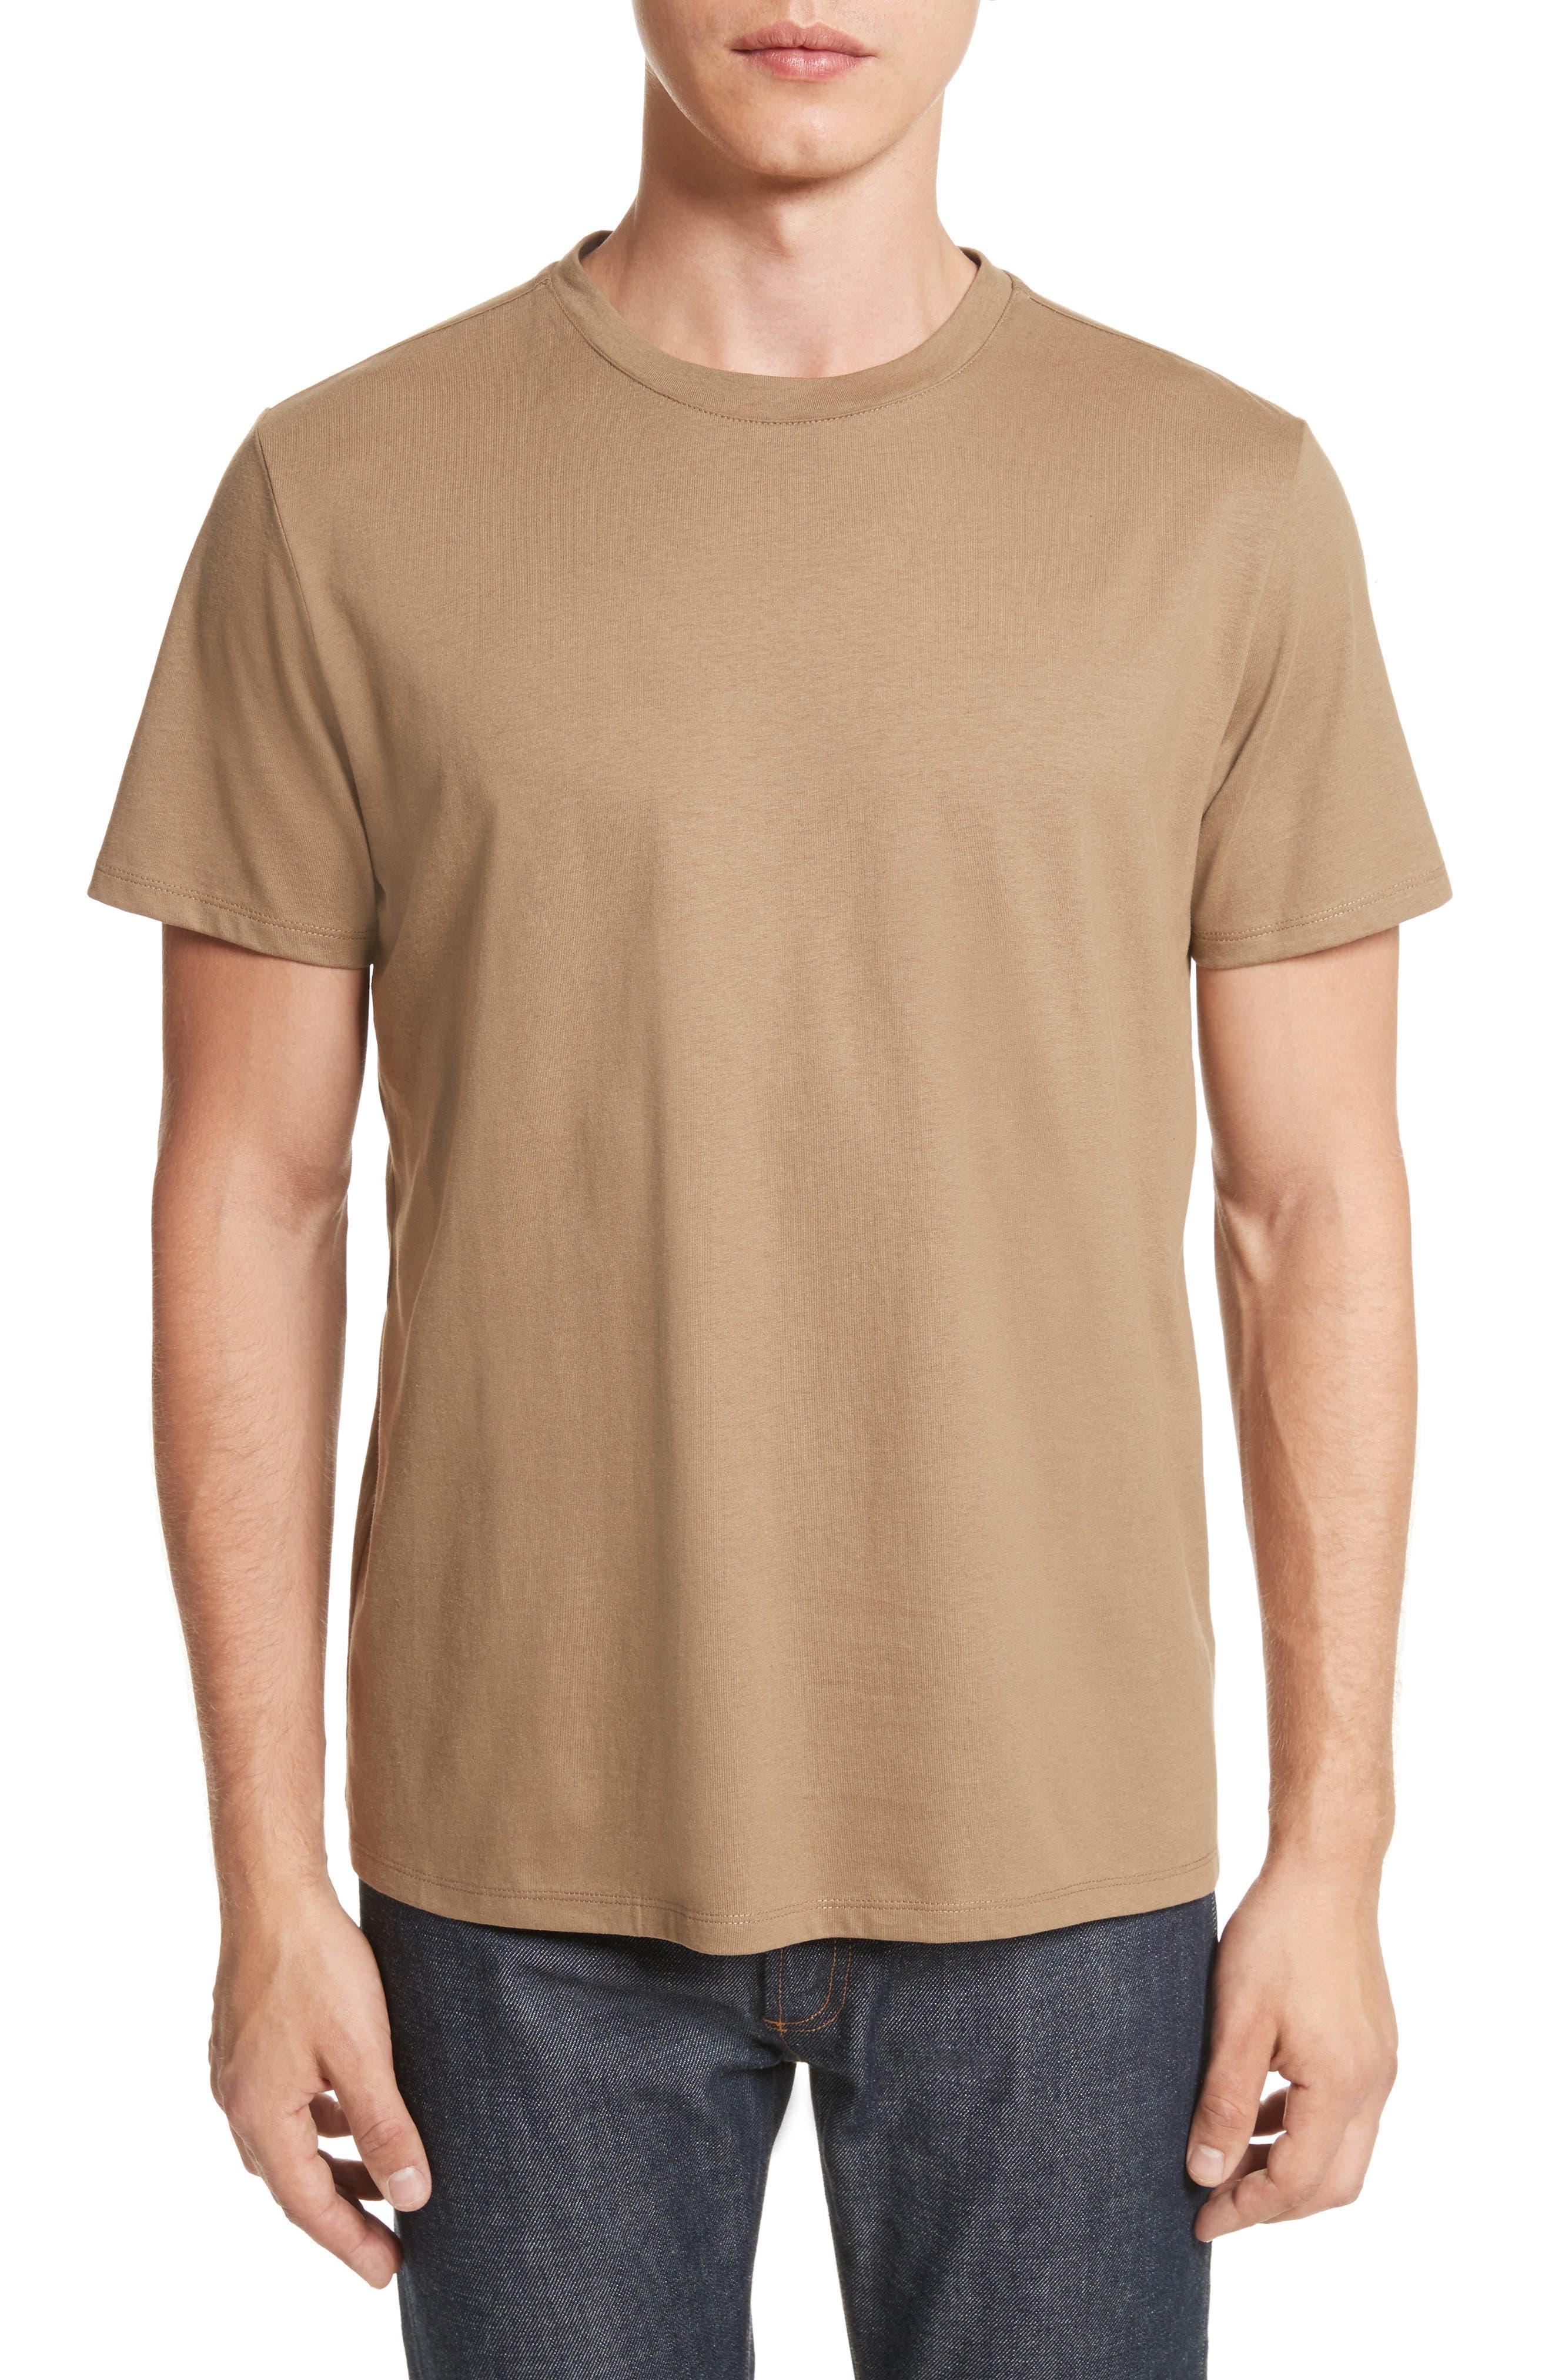 Jimmy T-Shirt,                             Main thumbnail 1, color,                             Taupe